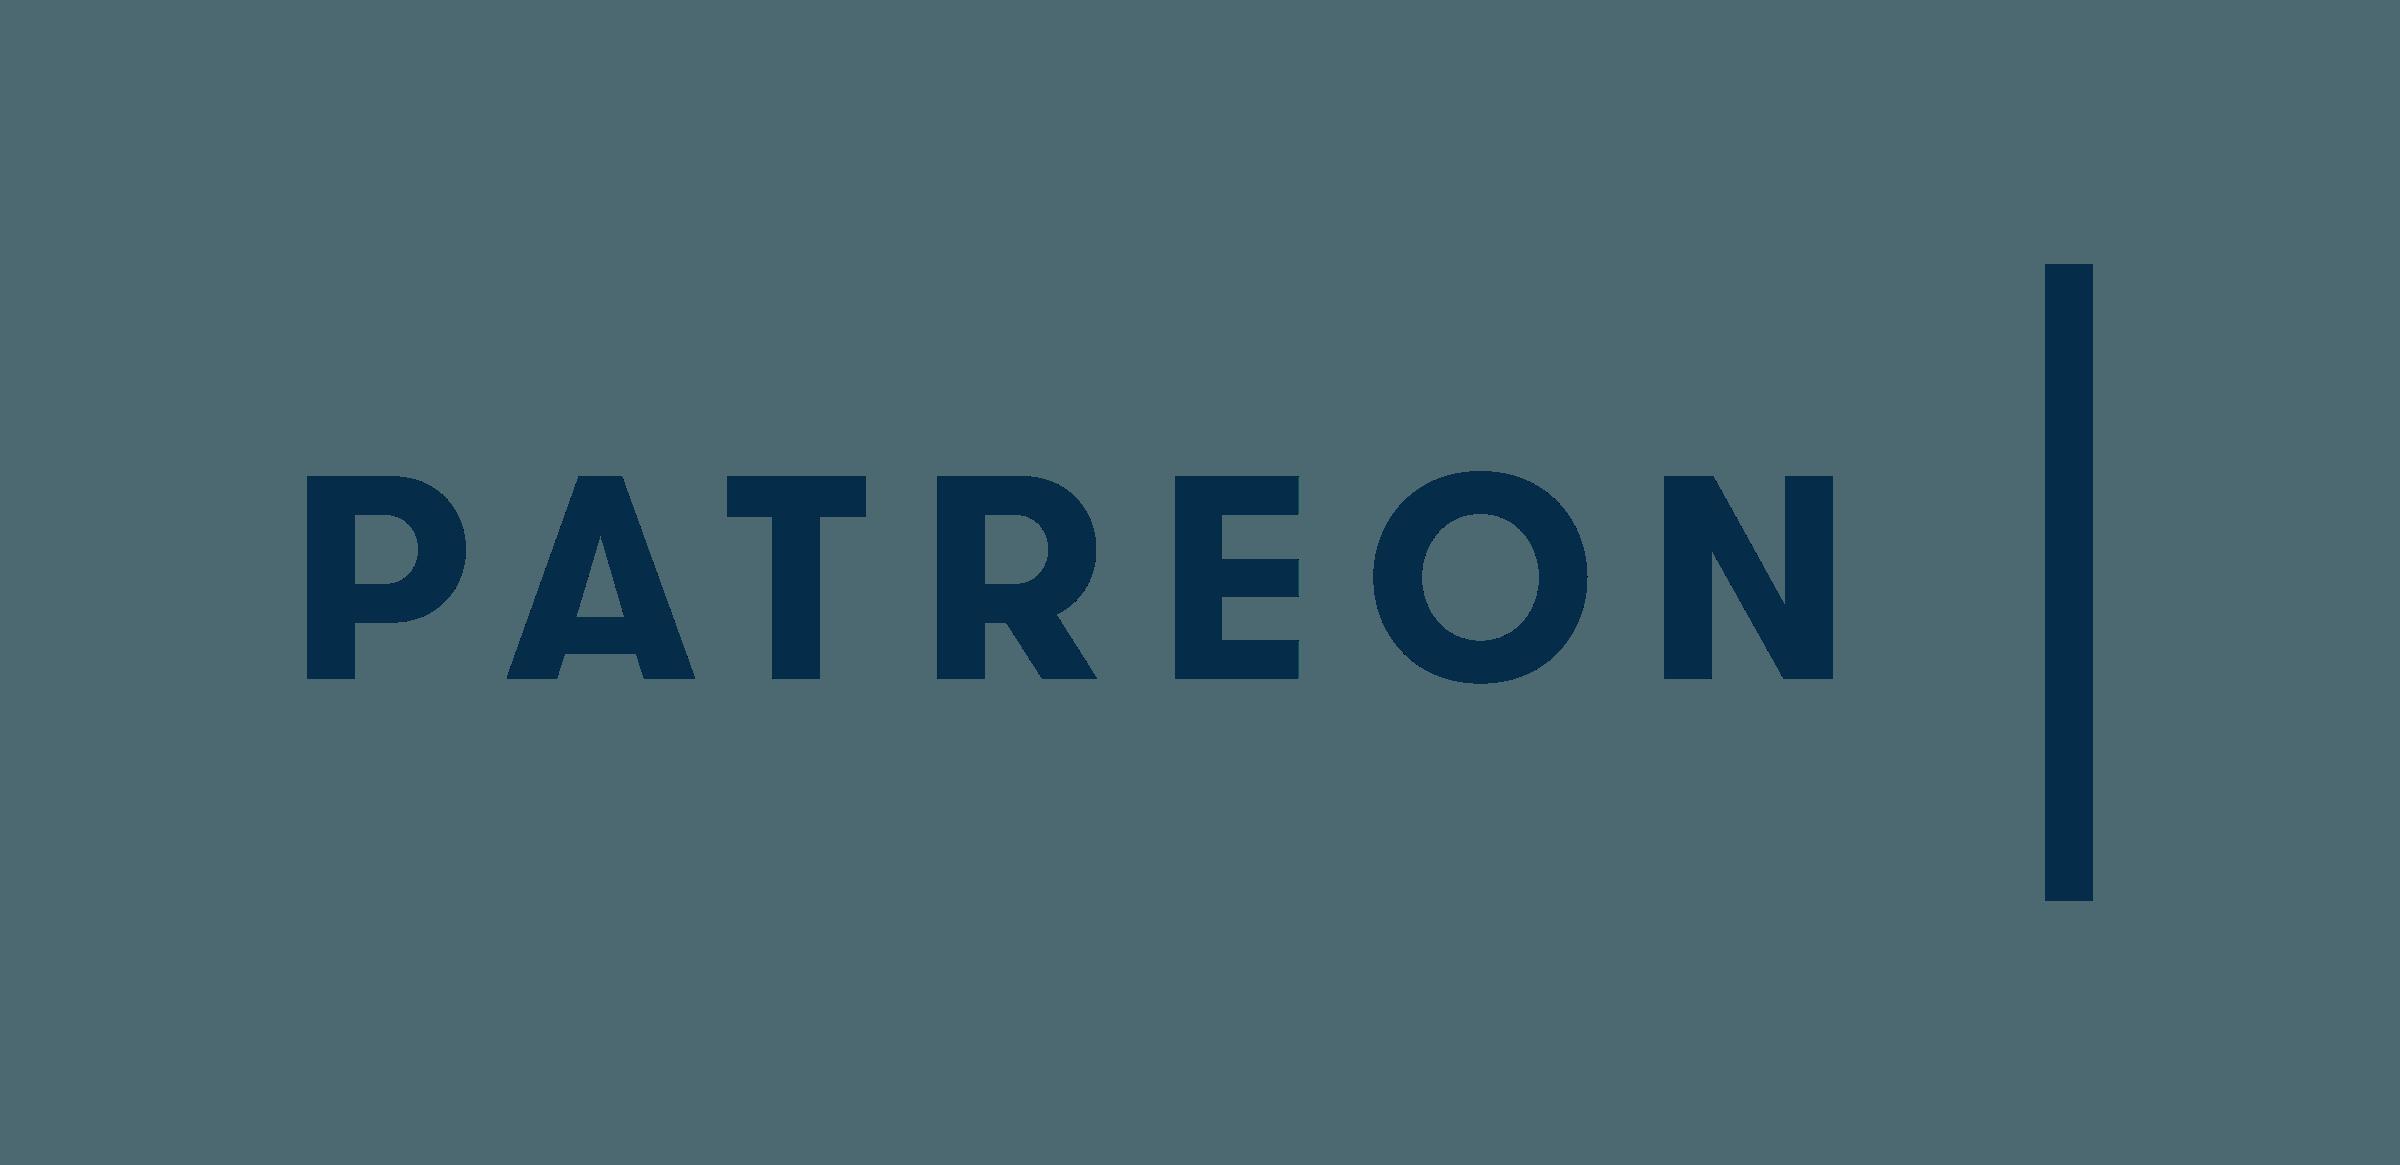 patreon-logo-transparent